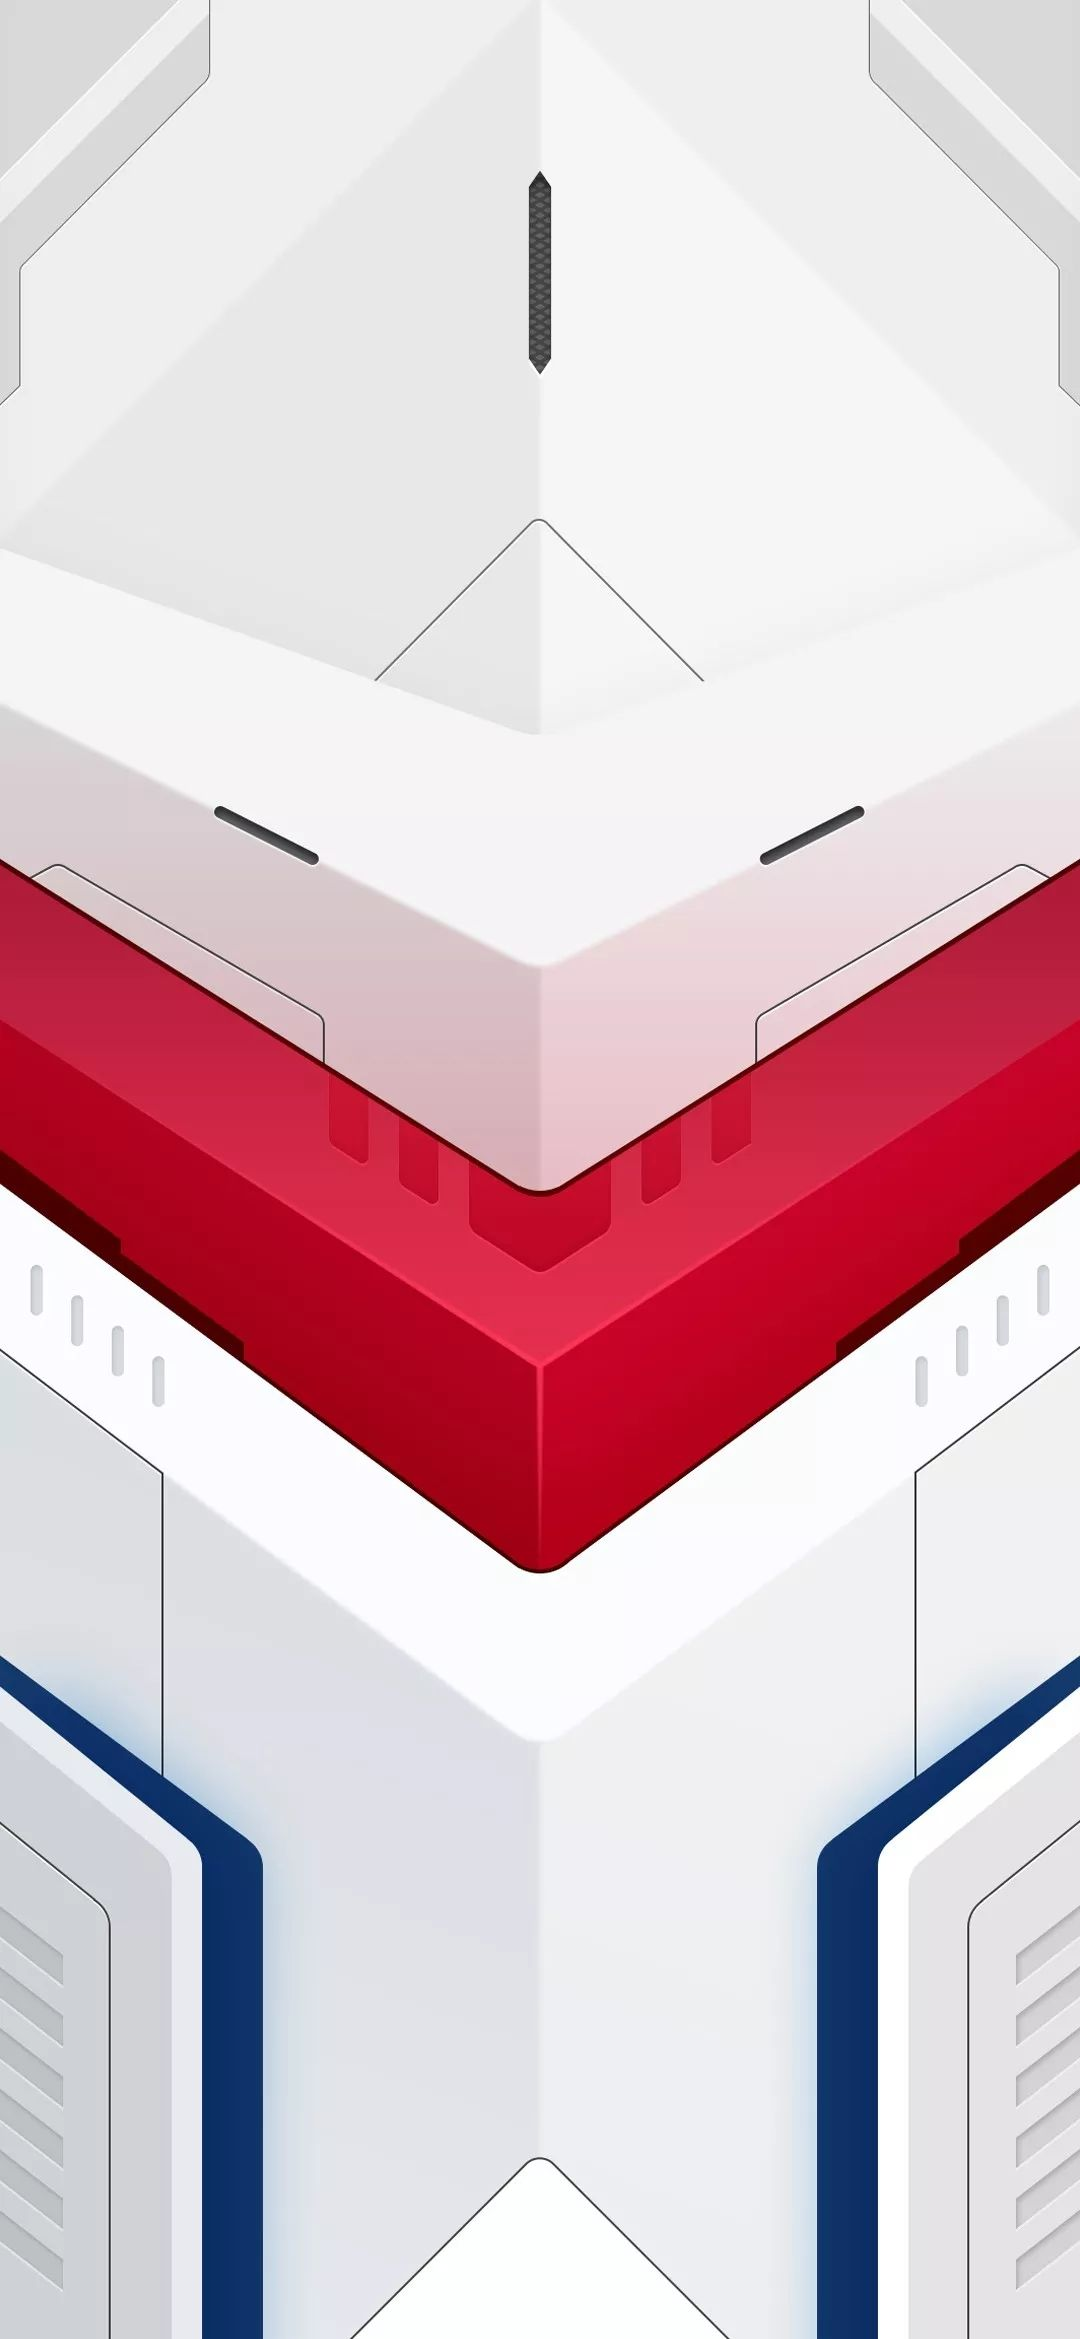 Oppo Reno Ace Gundam Edition Wallpaper Ytechb Exclusive Gundam Wallpapers Gundam Phone Wallpaper Design